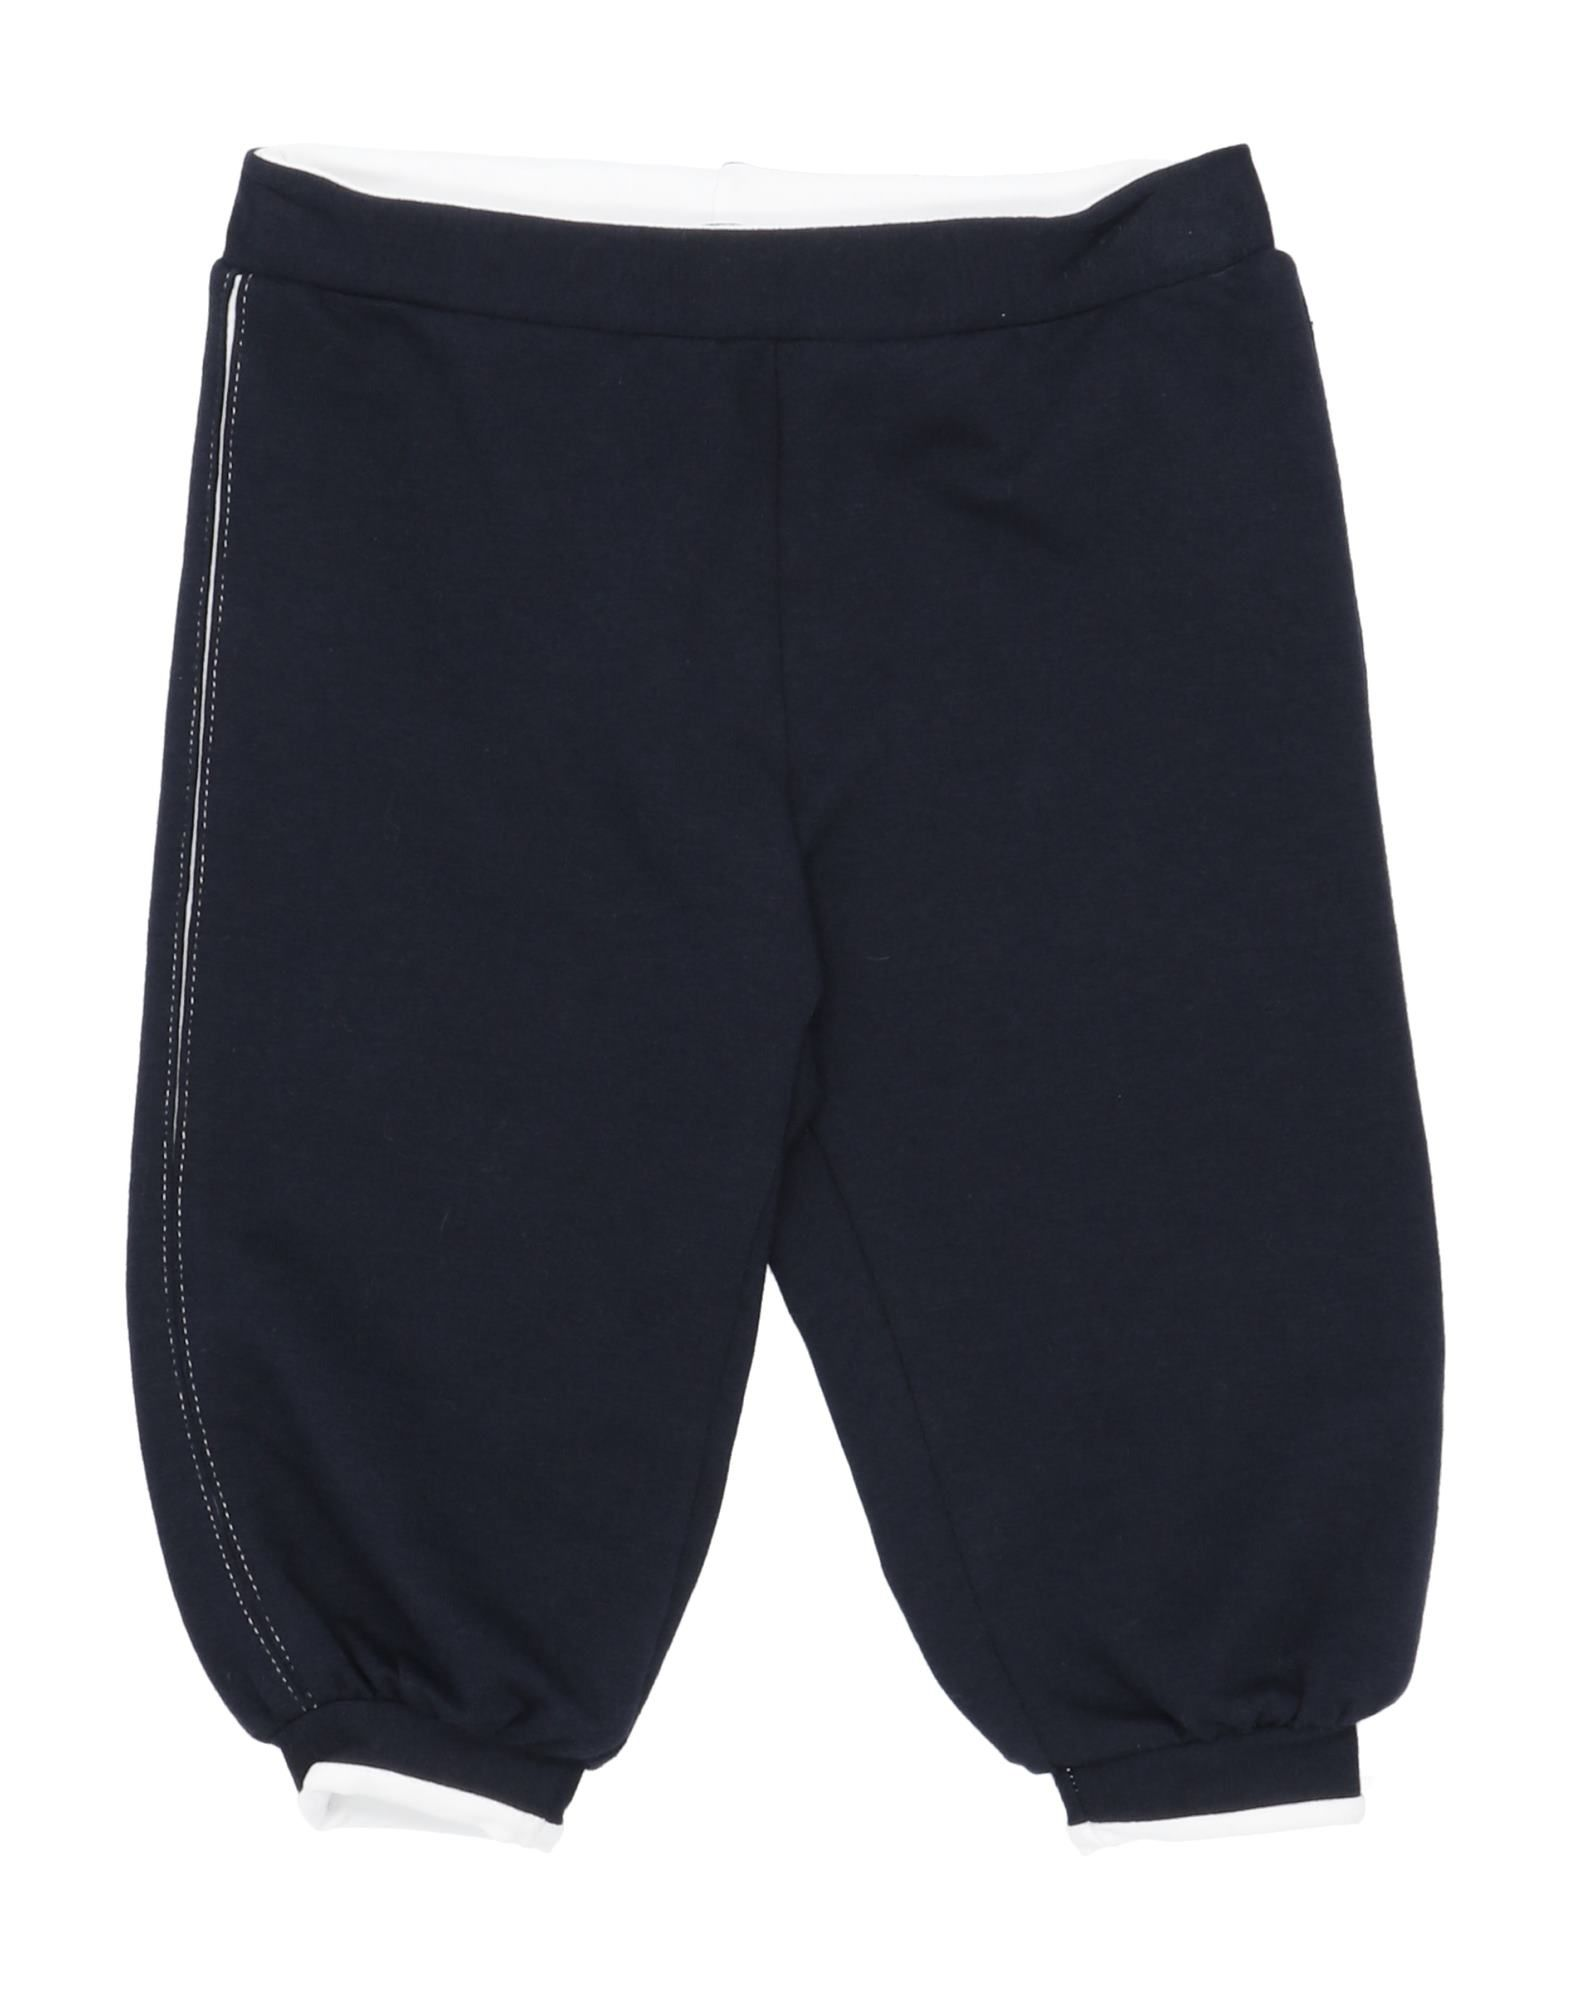 Bebebo' Kids' Casual Pants In Black